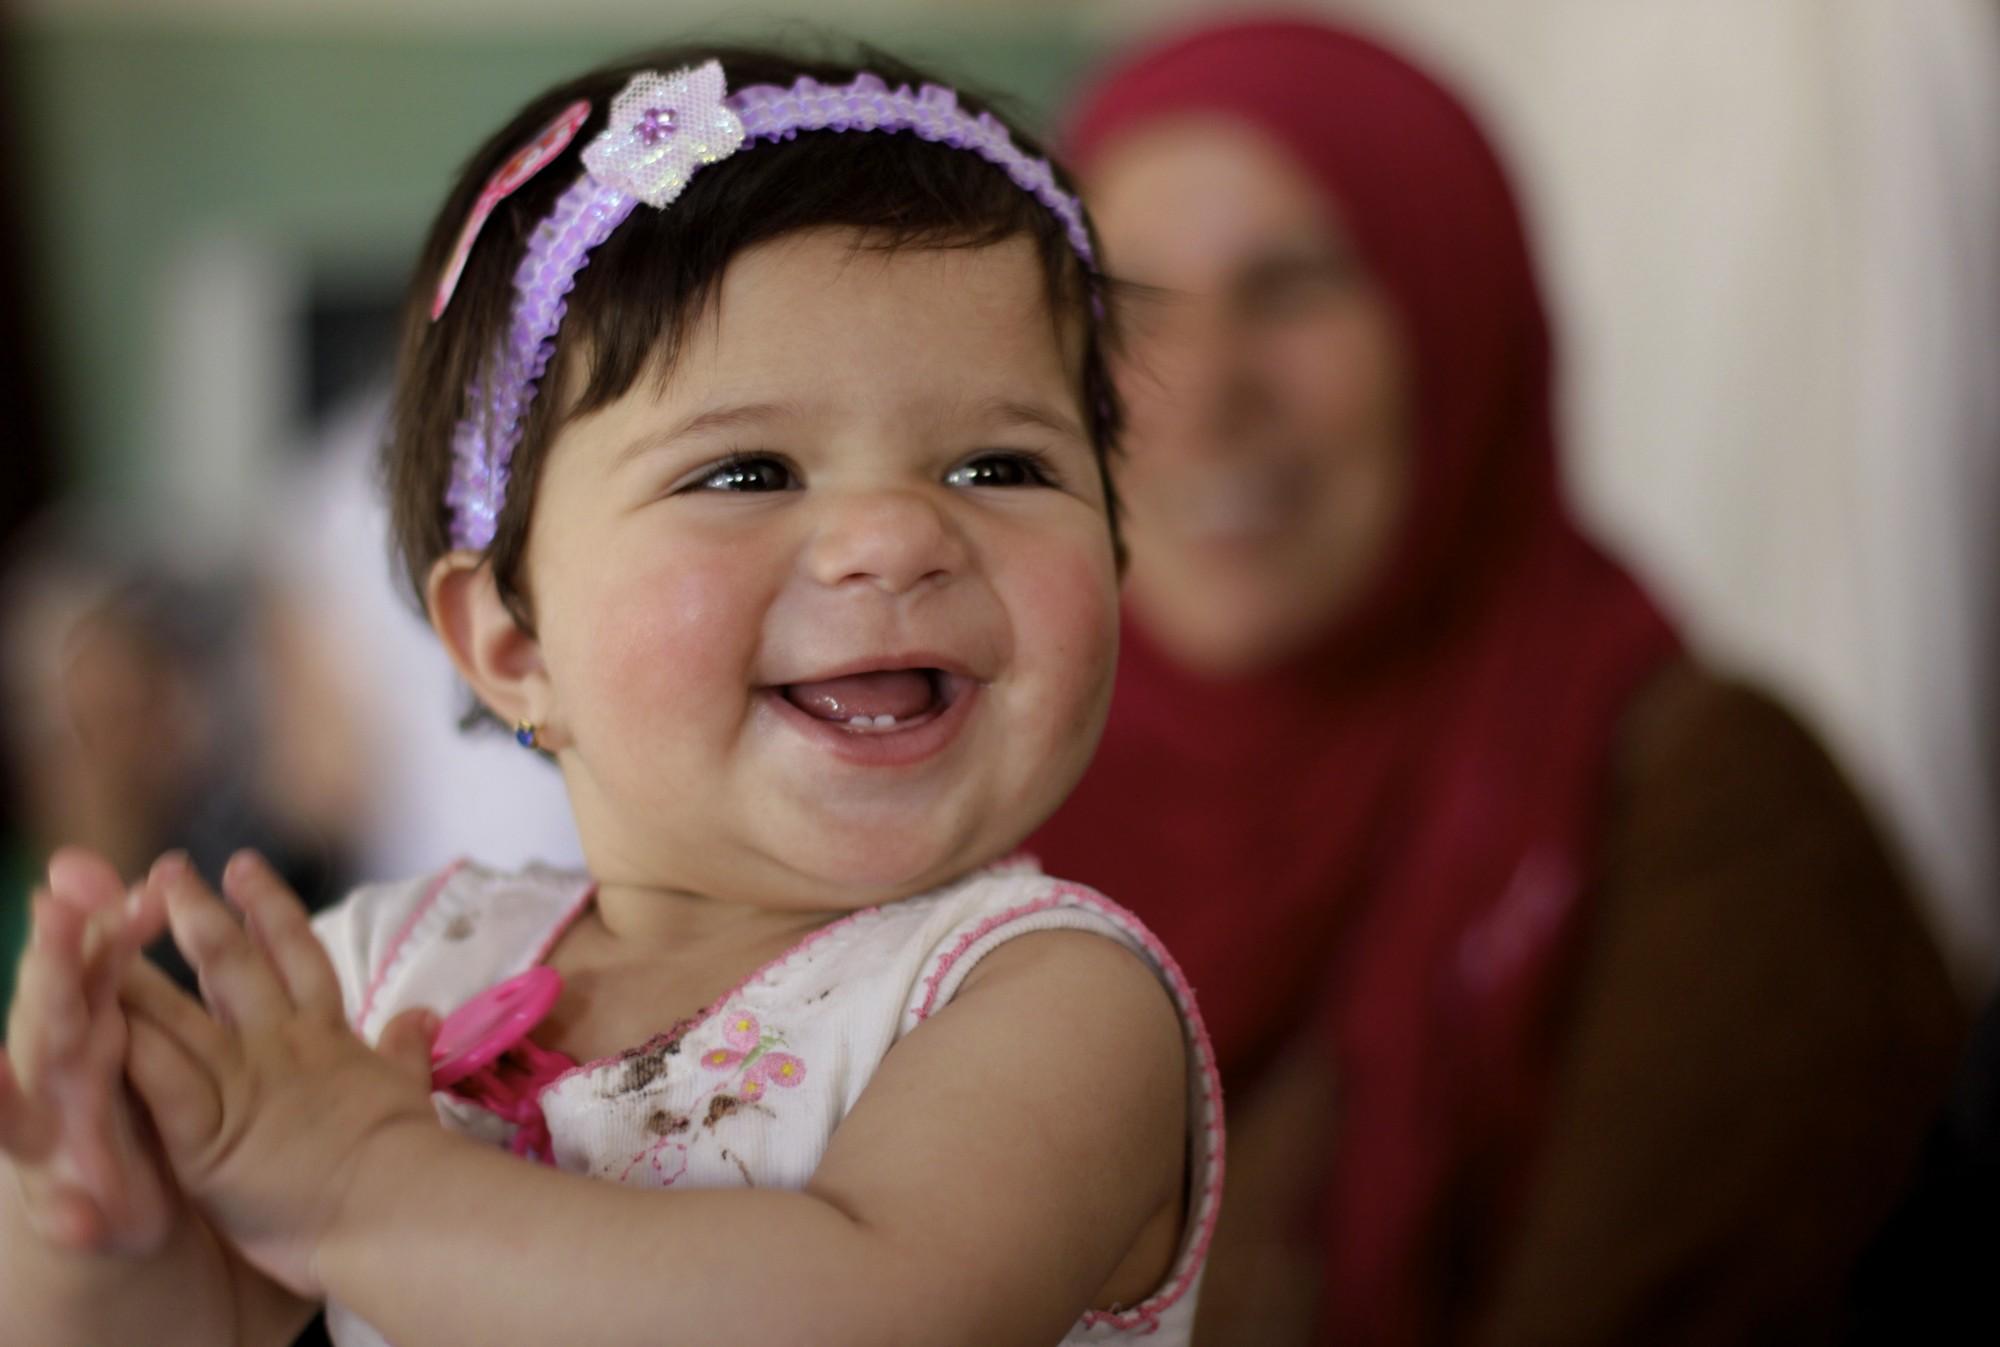 http://www.lavanguardia.com/internacional/20160316/40484200991/drama-ninos-refugiados-sirios.html